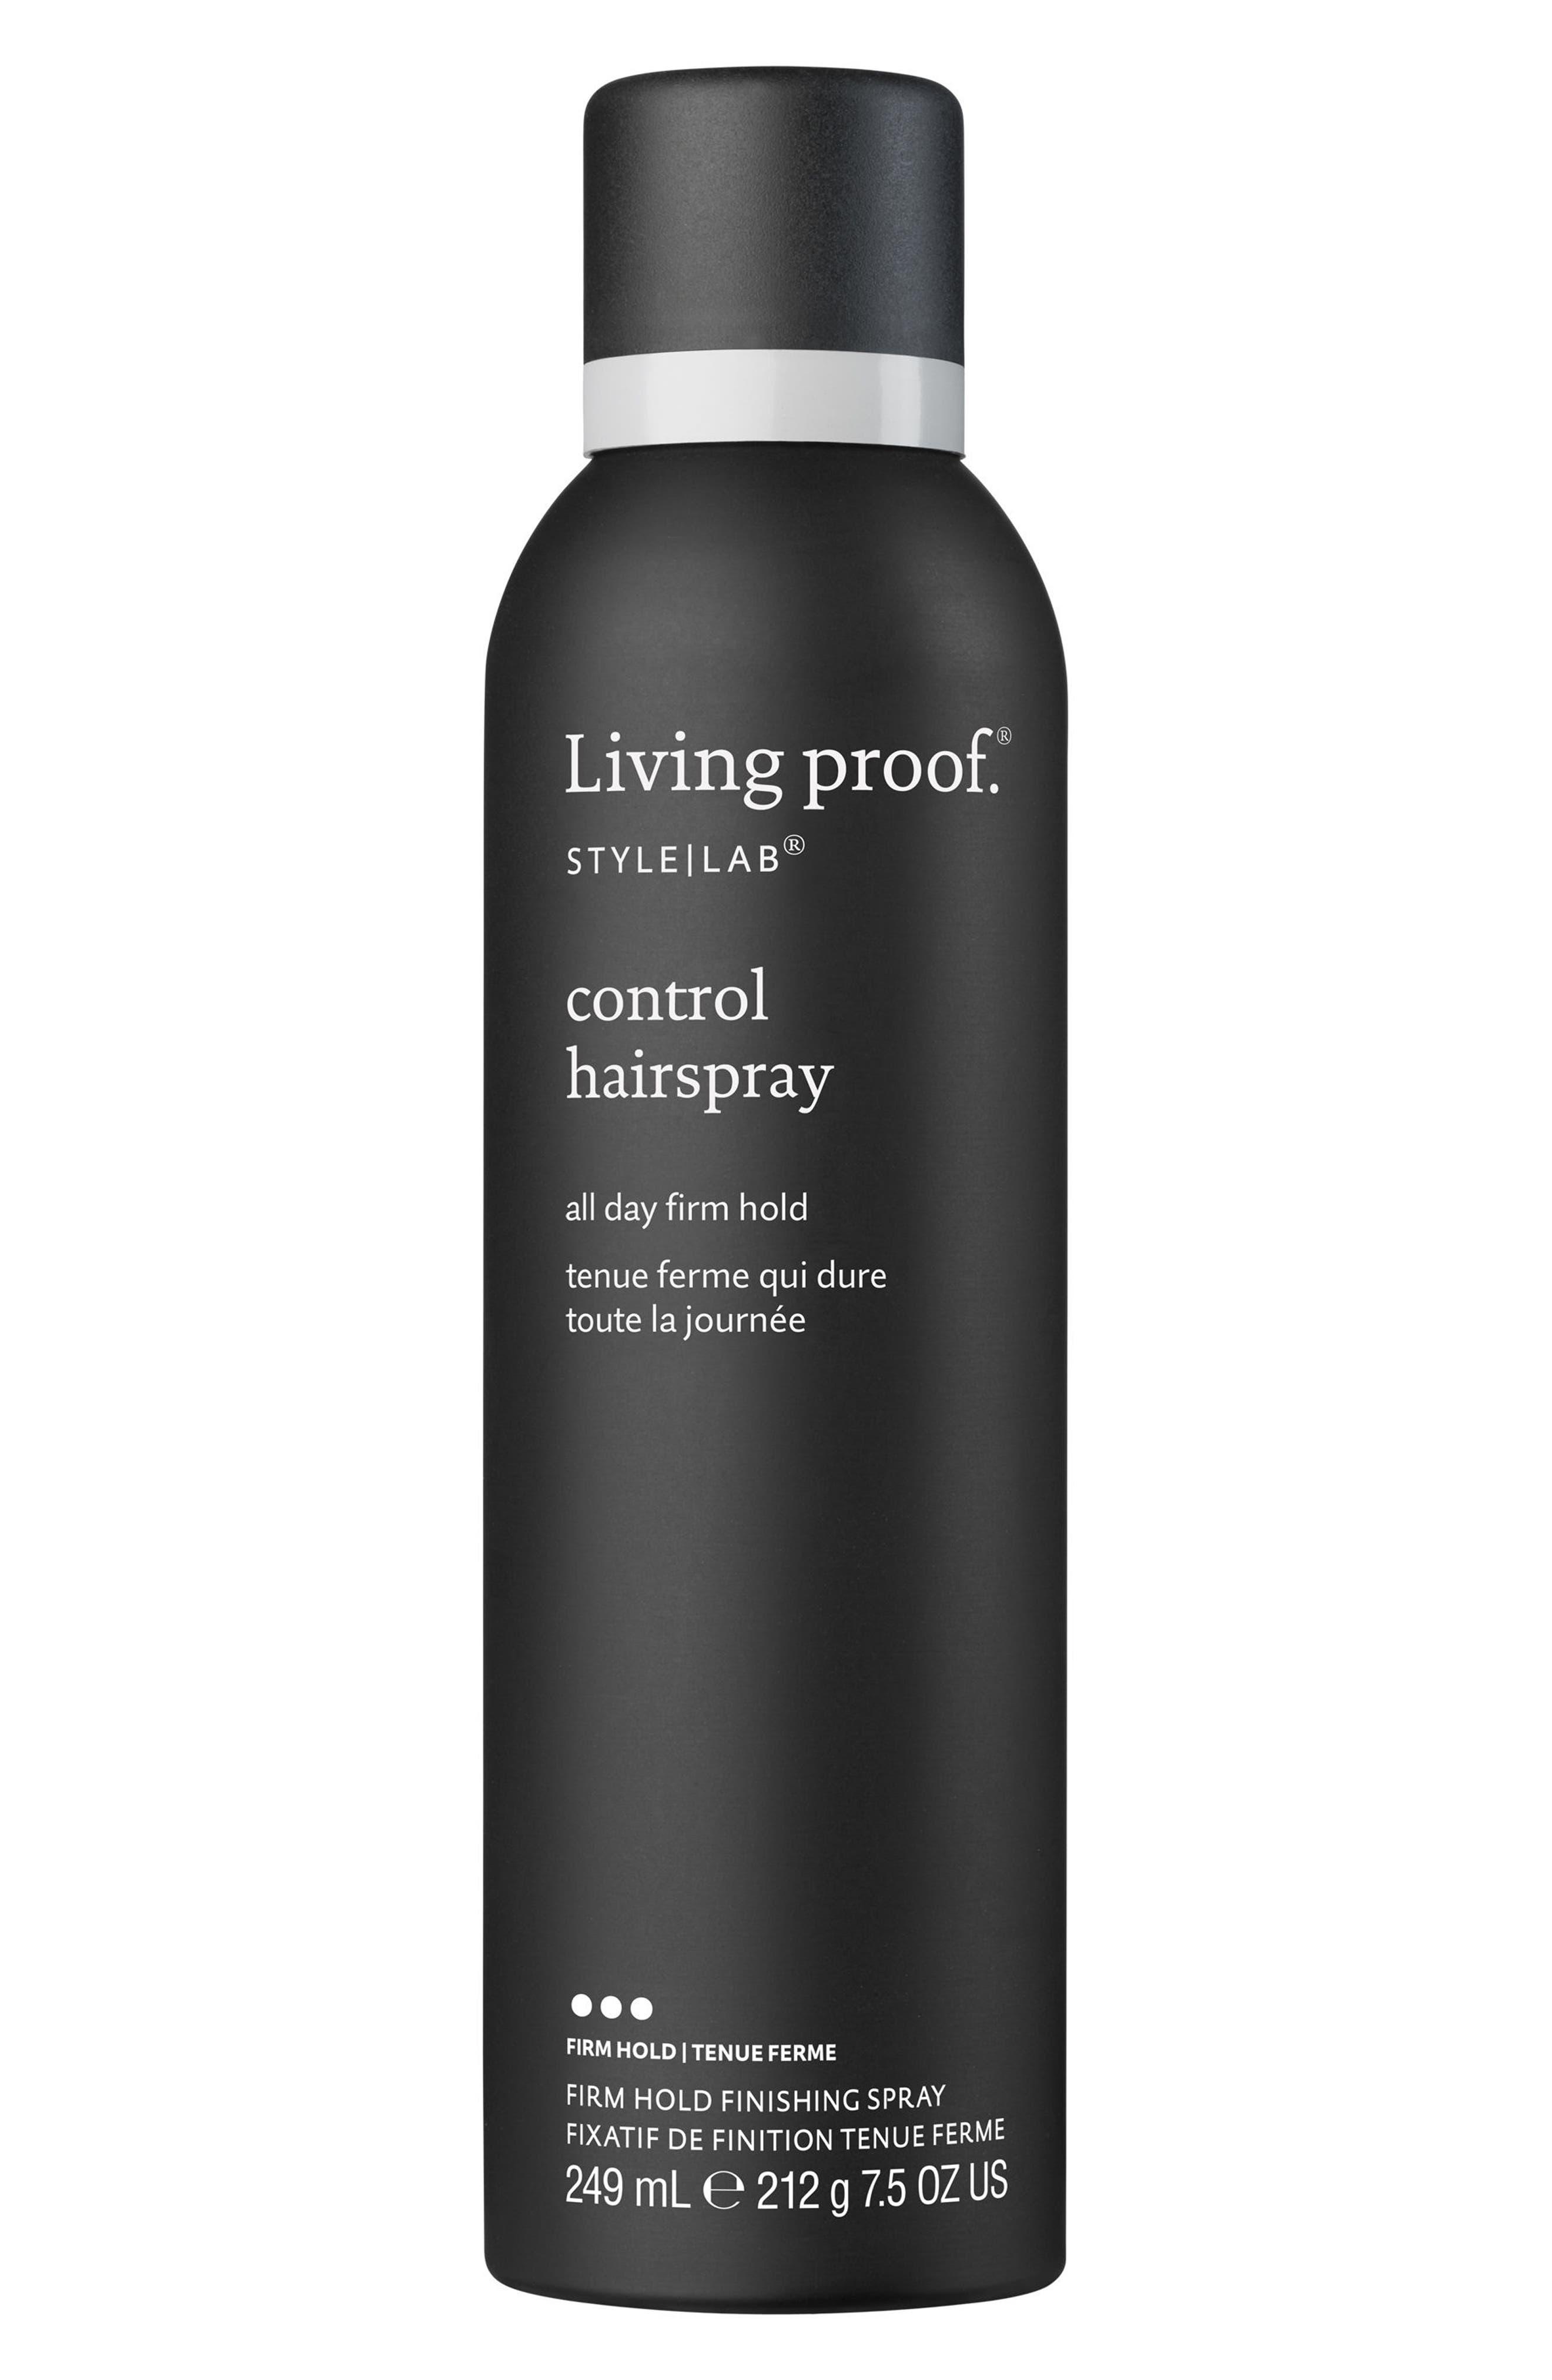 Alternate Image 1 Selected - Living proof® Control Hairspray